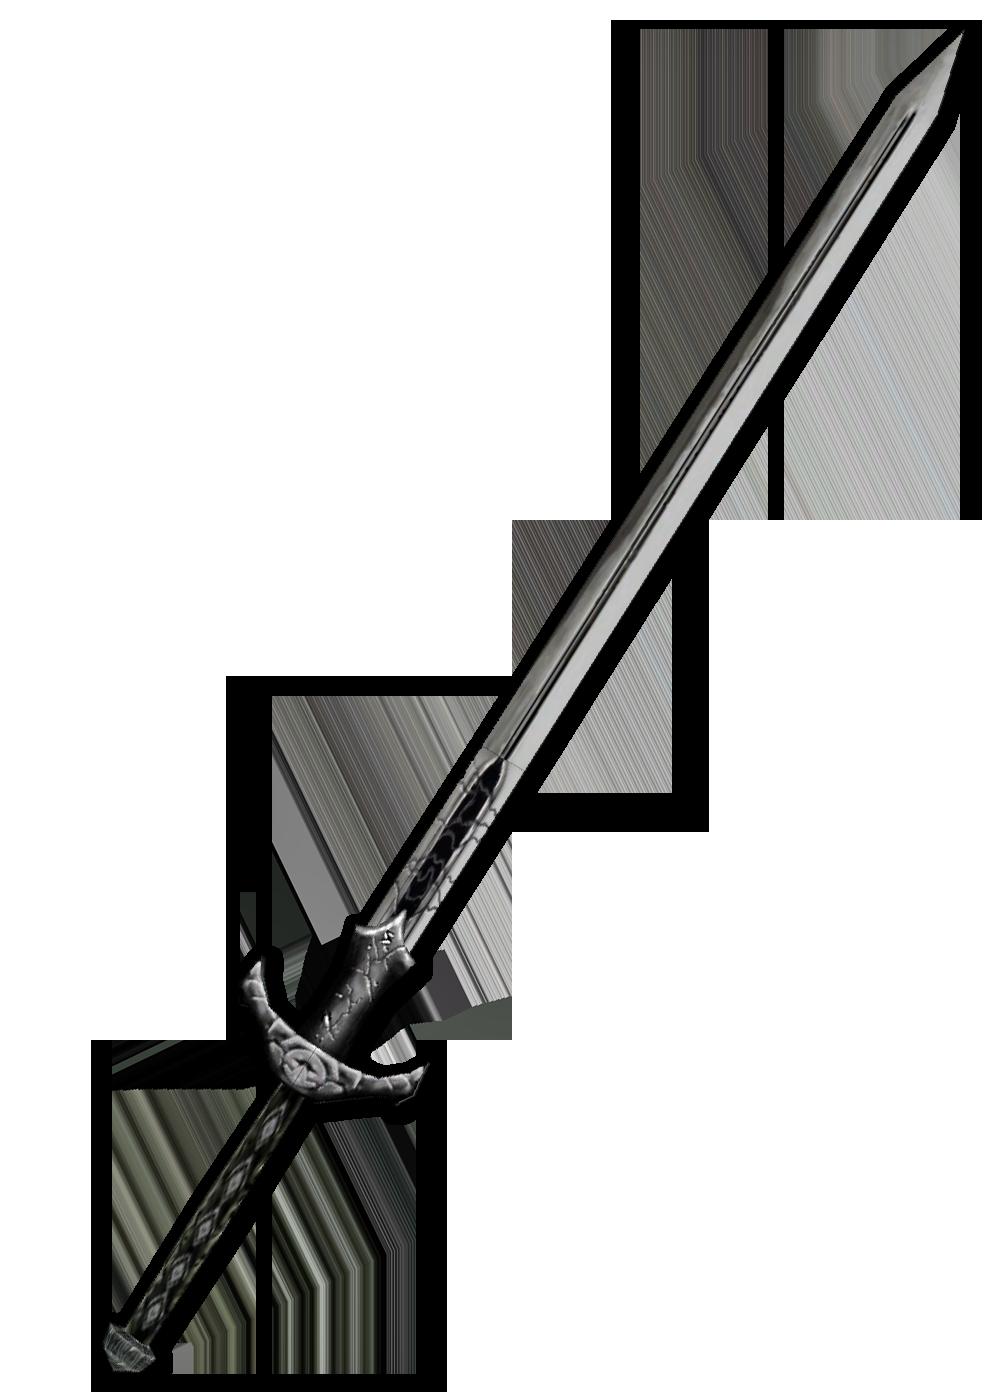 Clipart sword original. Png file transparentpng